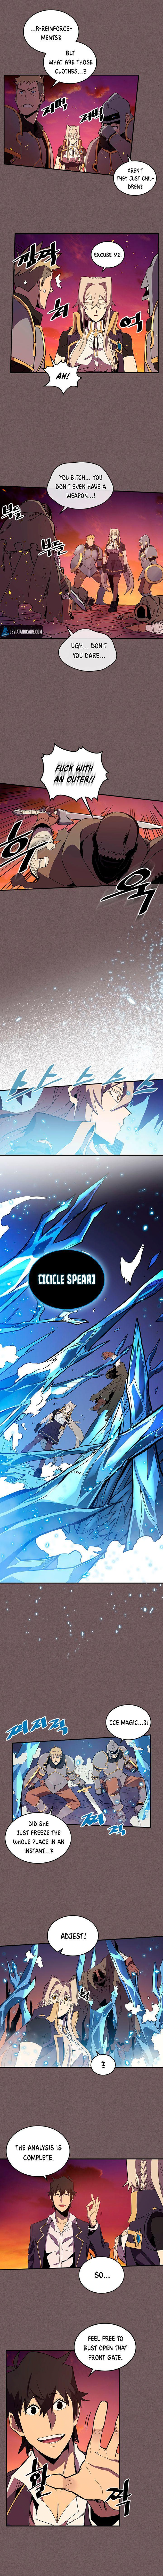 A Returner's Magic Should Be Special Chapter 83 page 6 - Mangakakalots.com